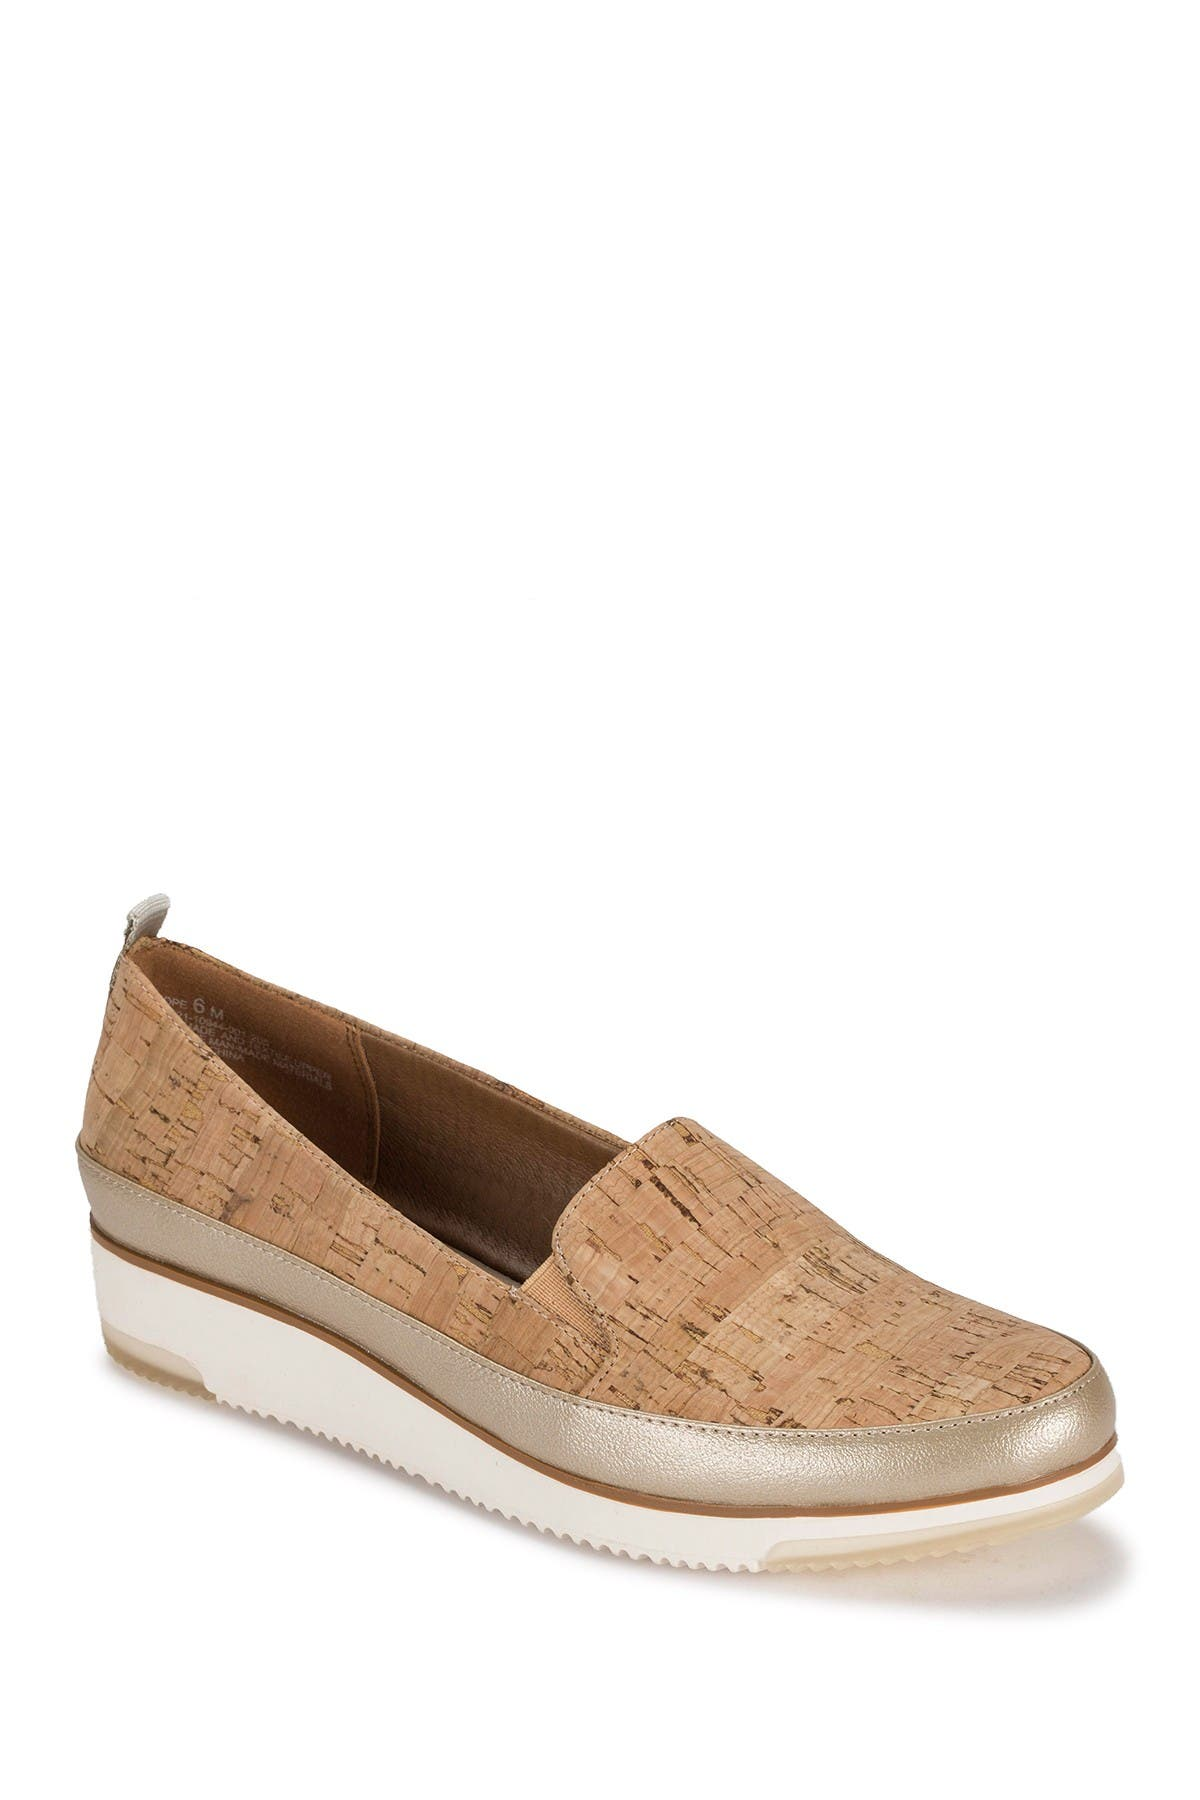 Baretraps Shoes HOPE